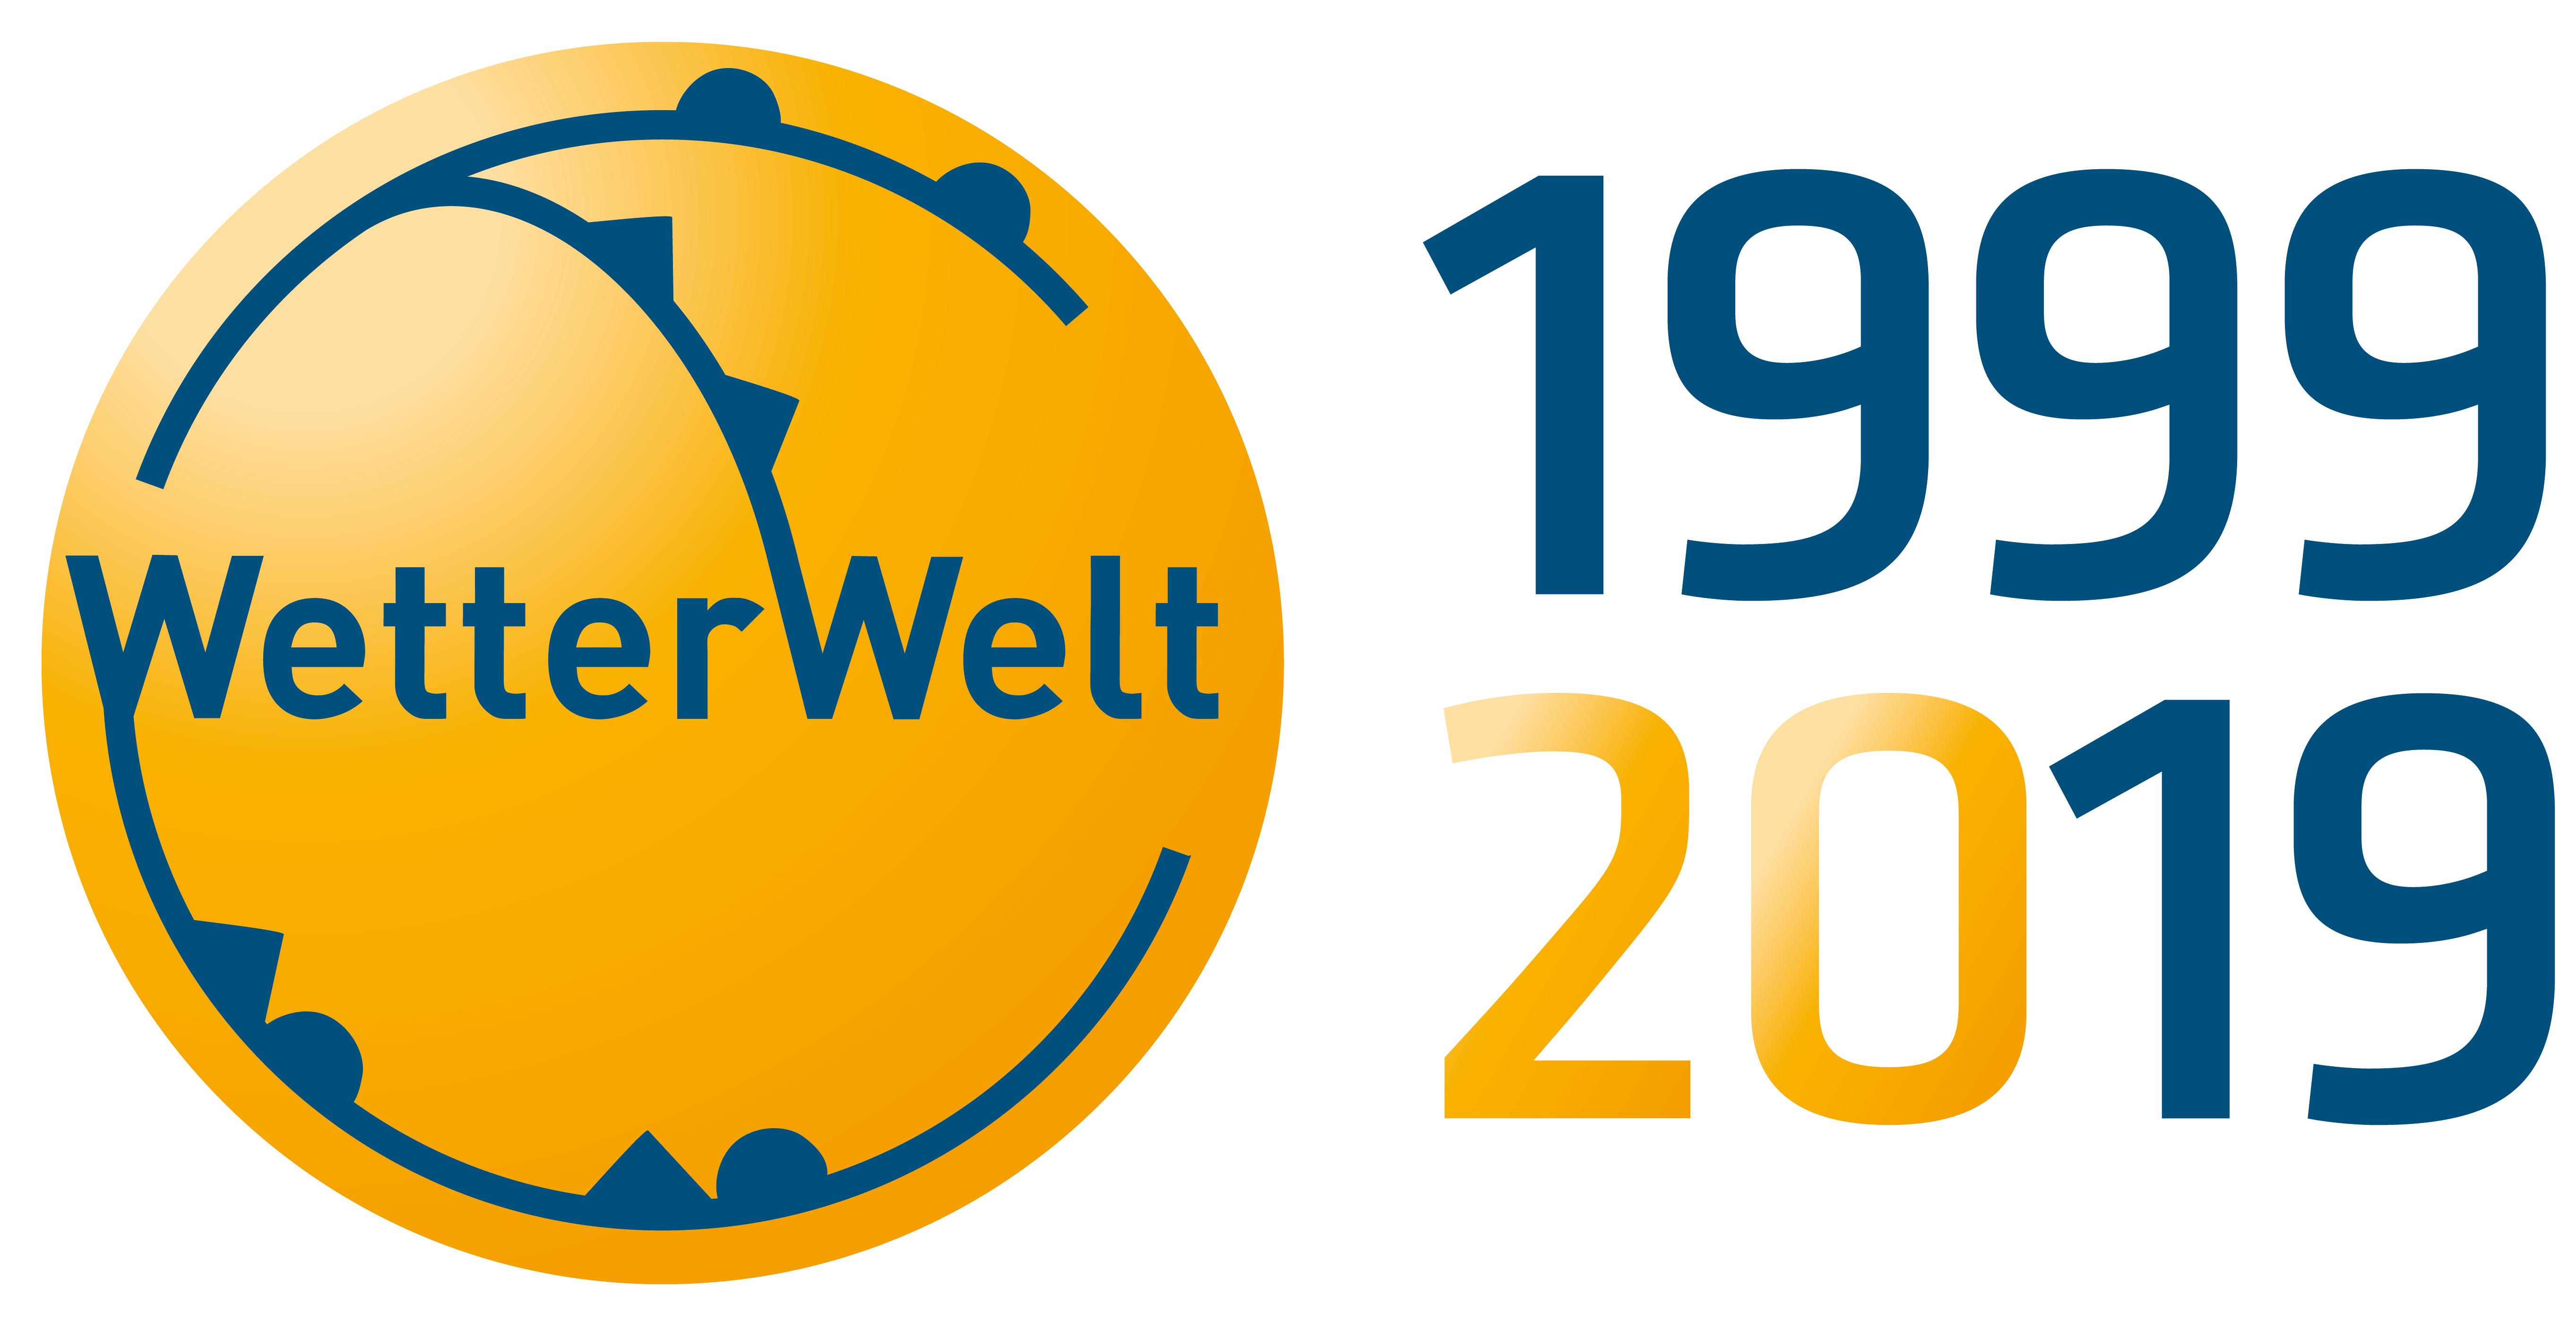 Shipping WetterWelt